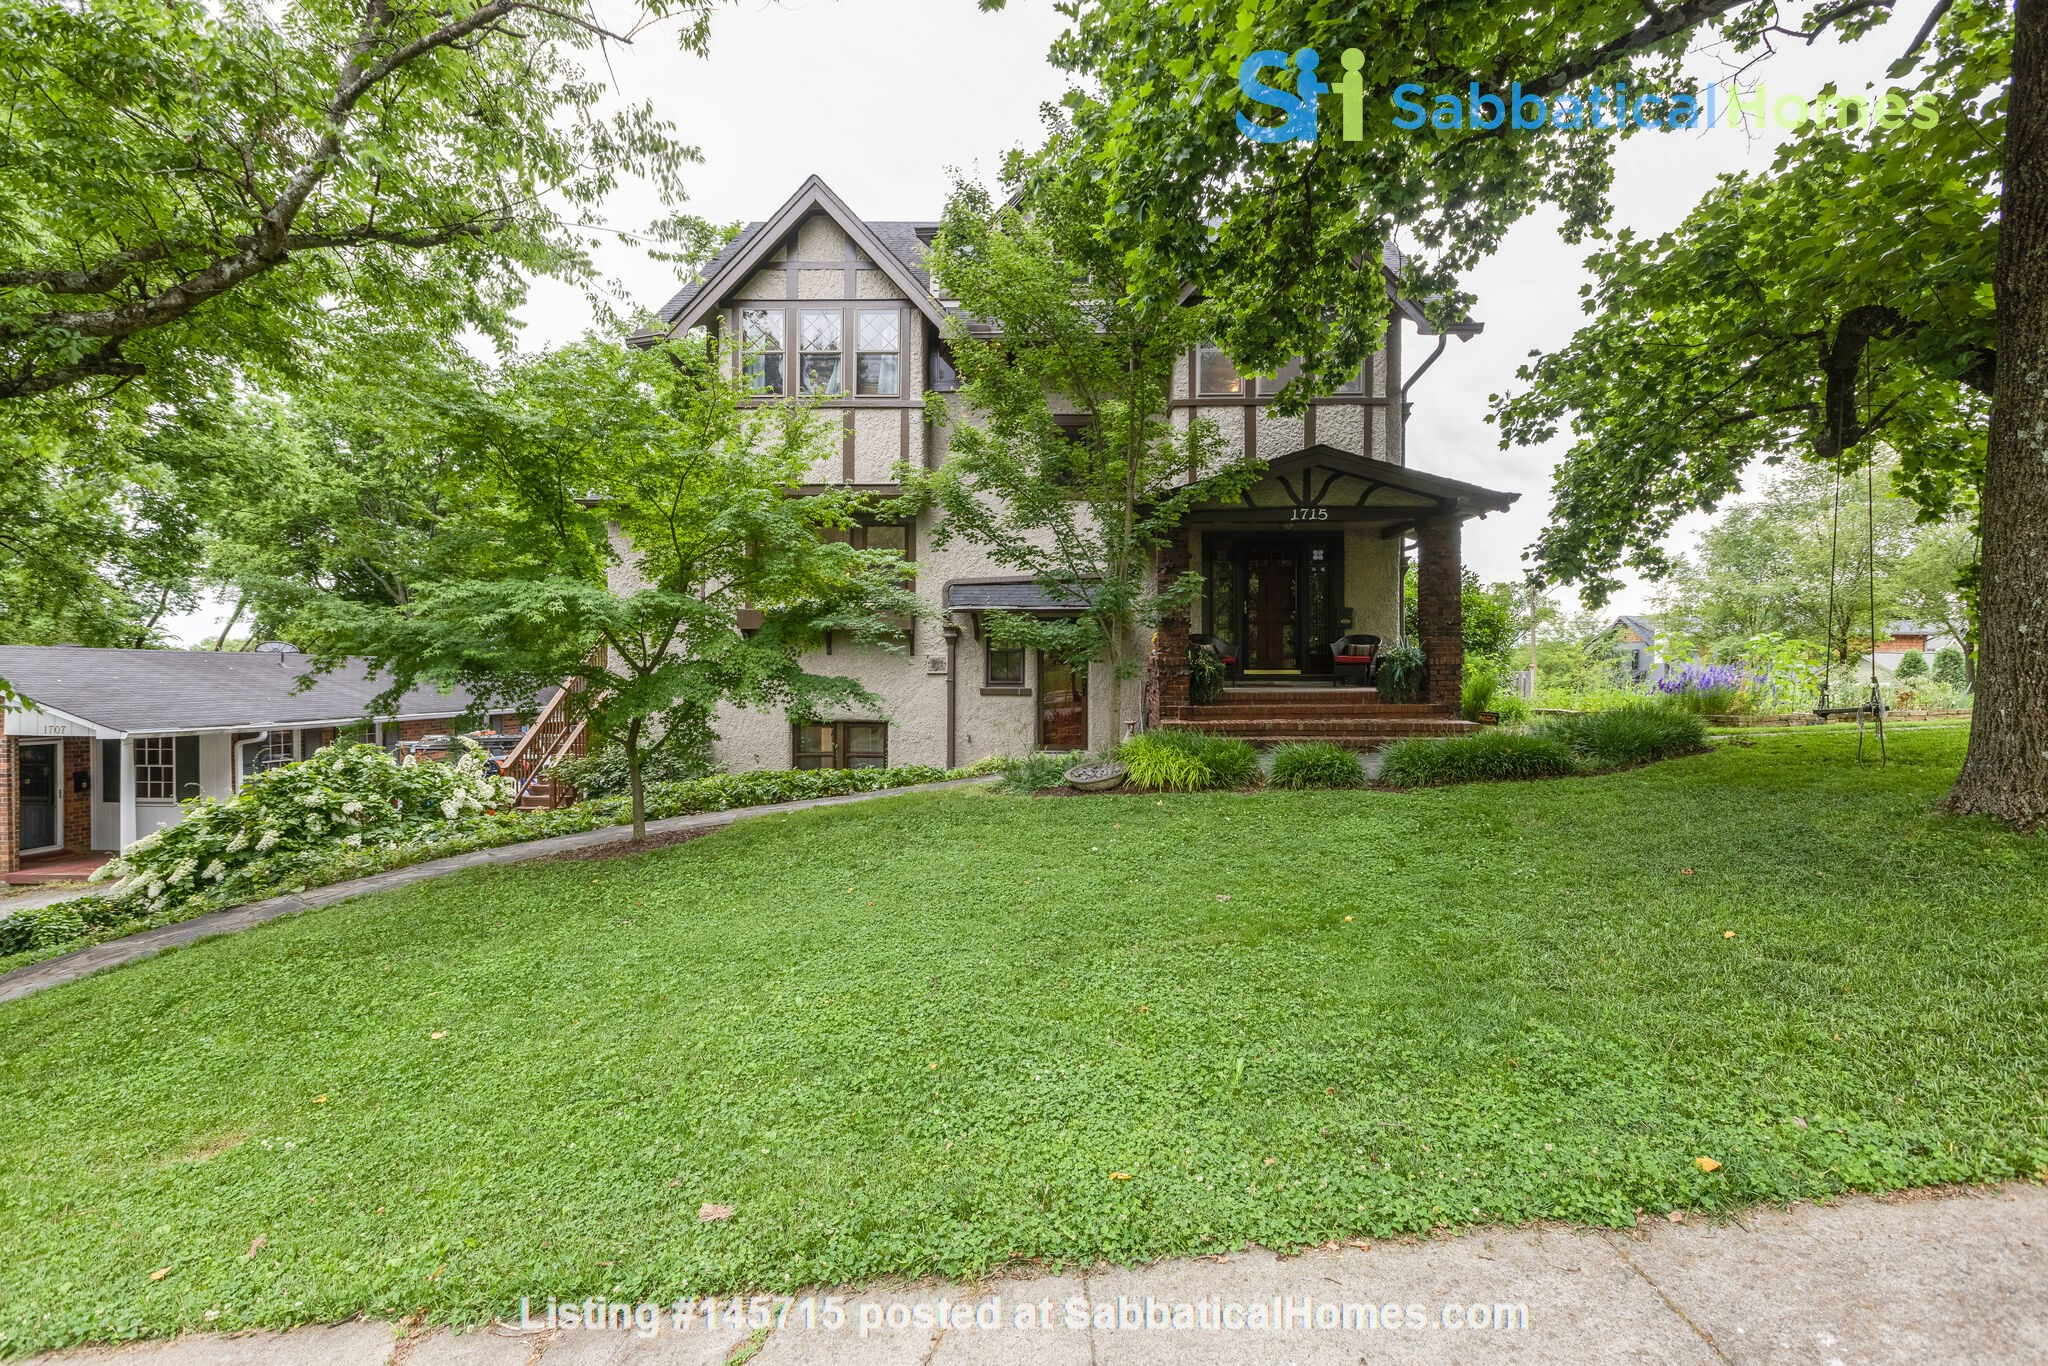 5 BR/3 + 2 BA Historic gem in Belmont-Hillsboro Home Rental in Nashville 0